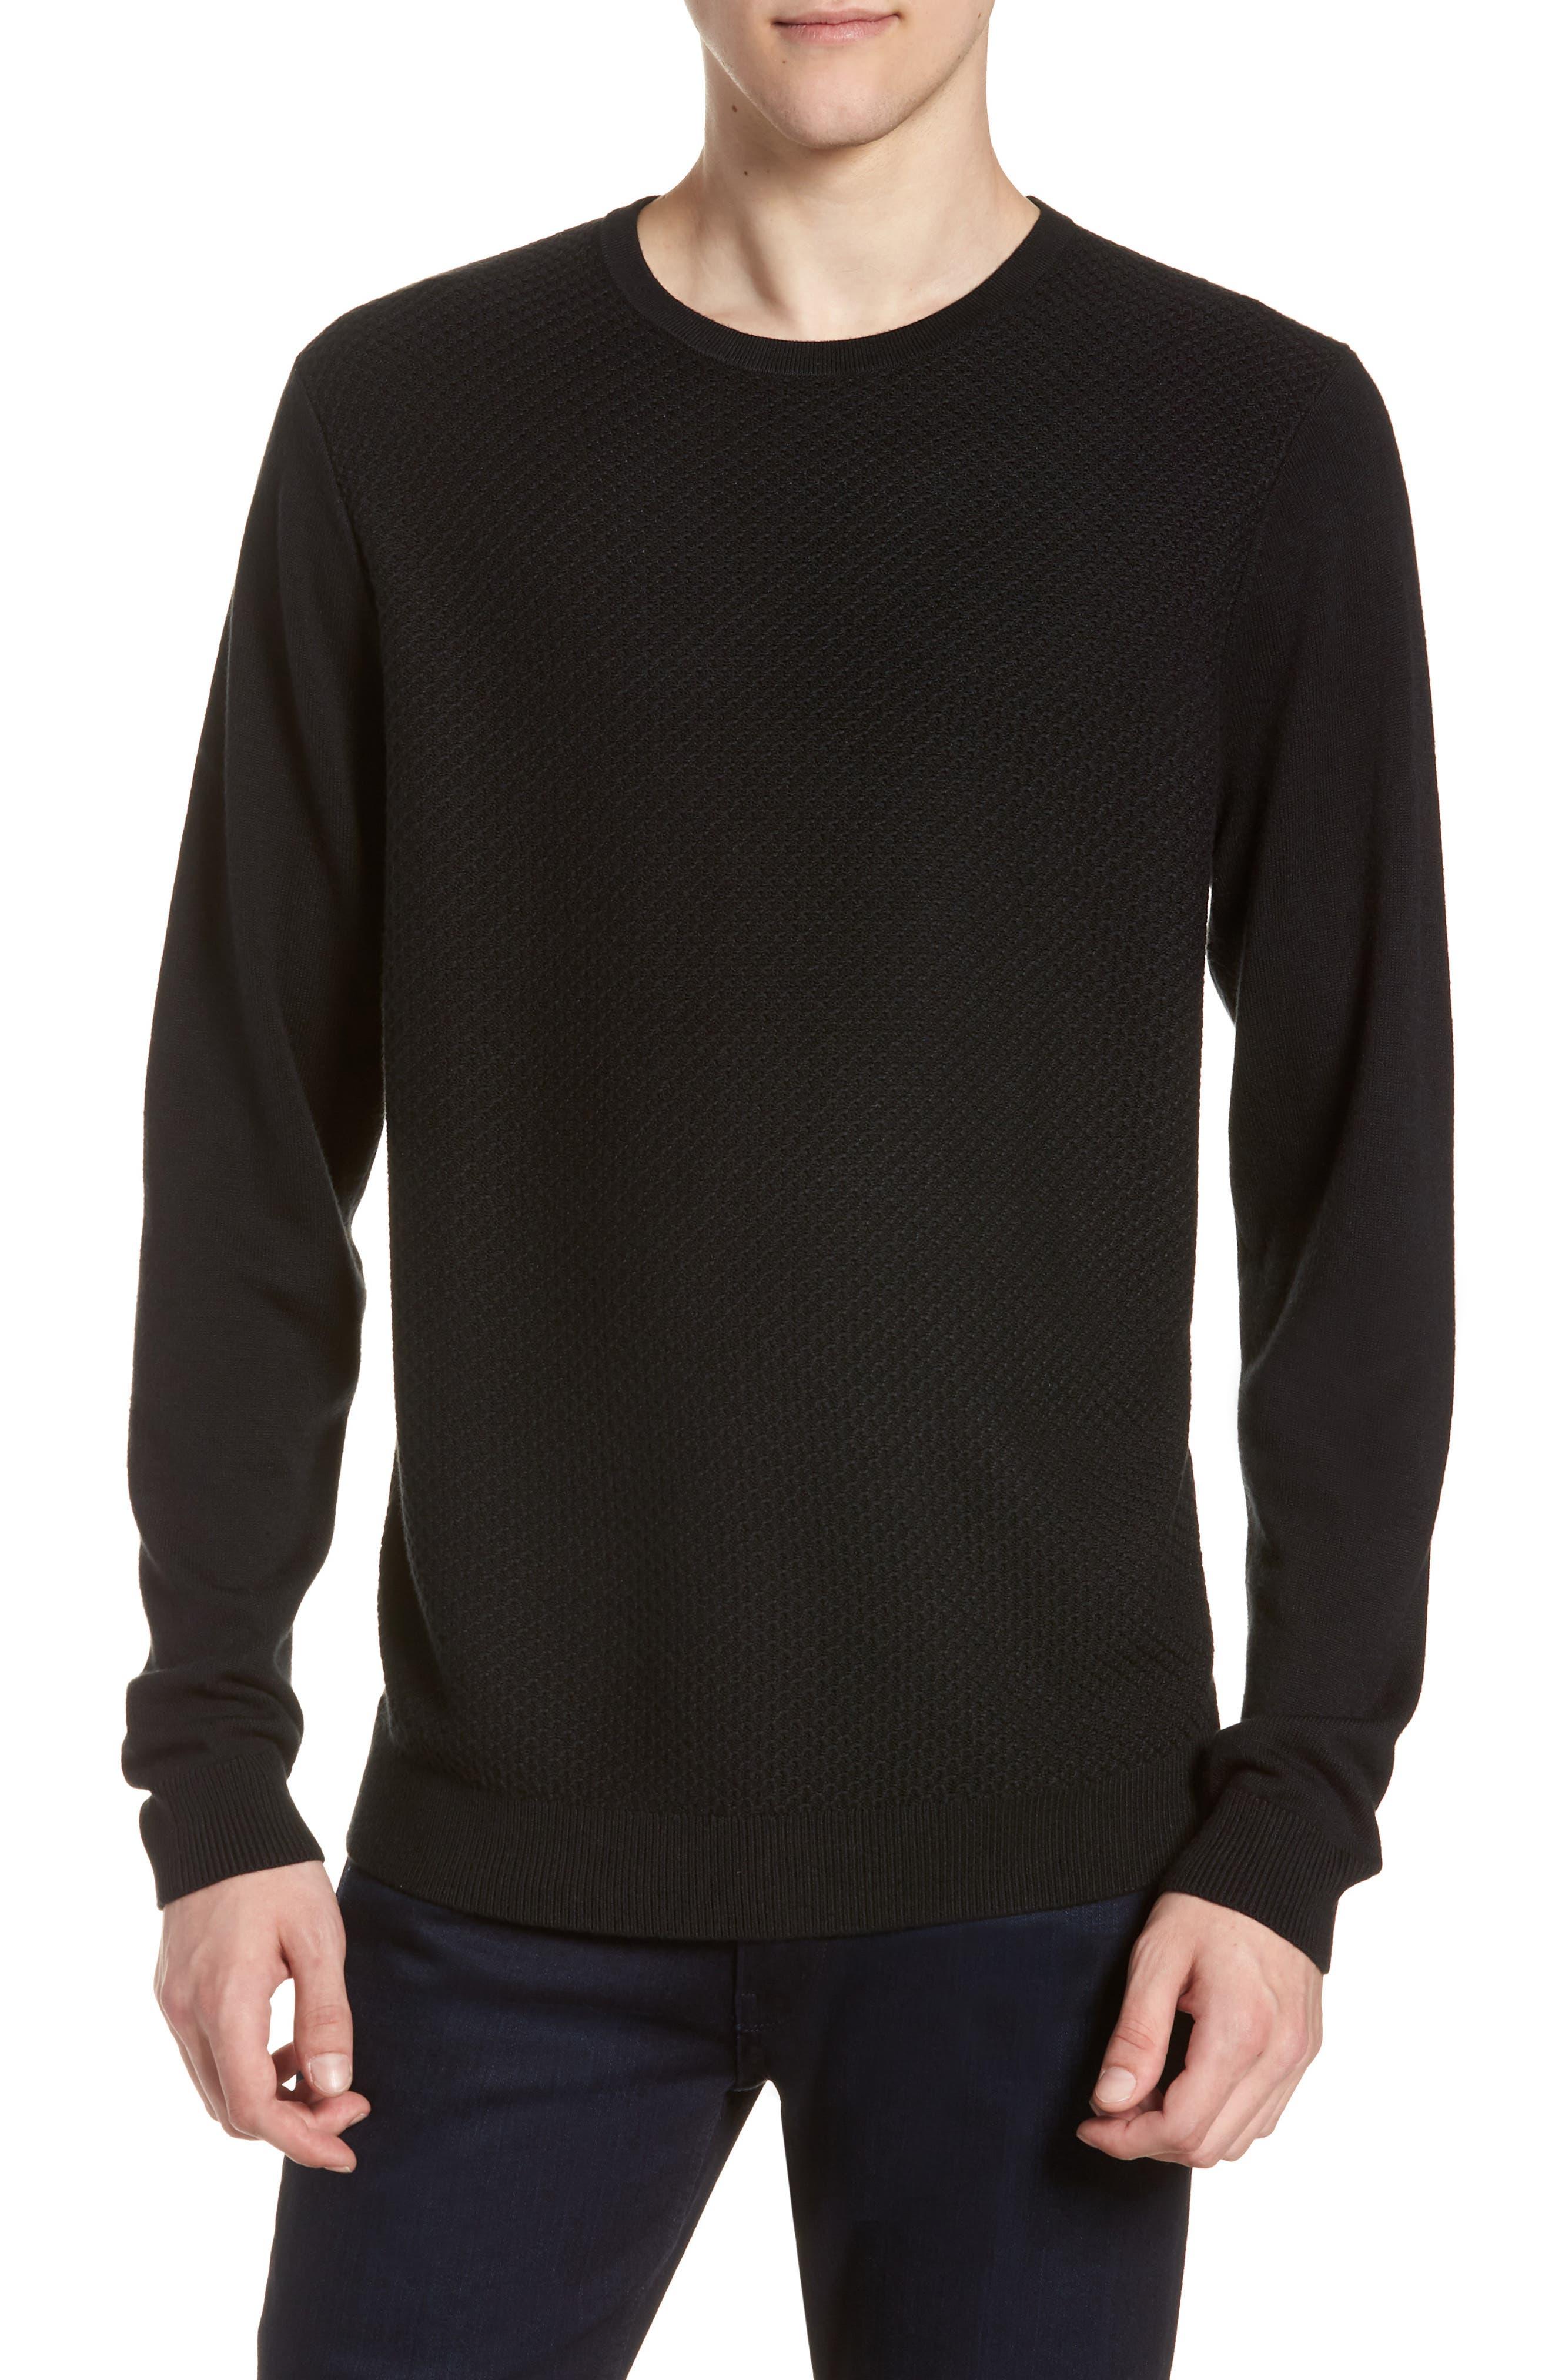 Honeycomb Crewneck Sweater,                             Main thumbnail 1, color,                             001